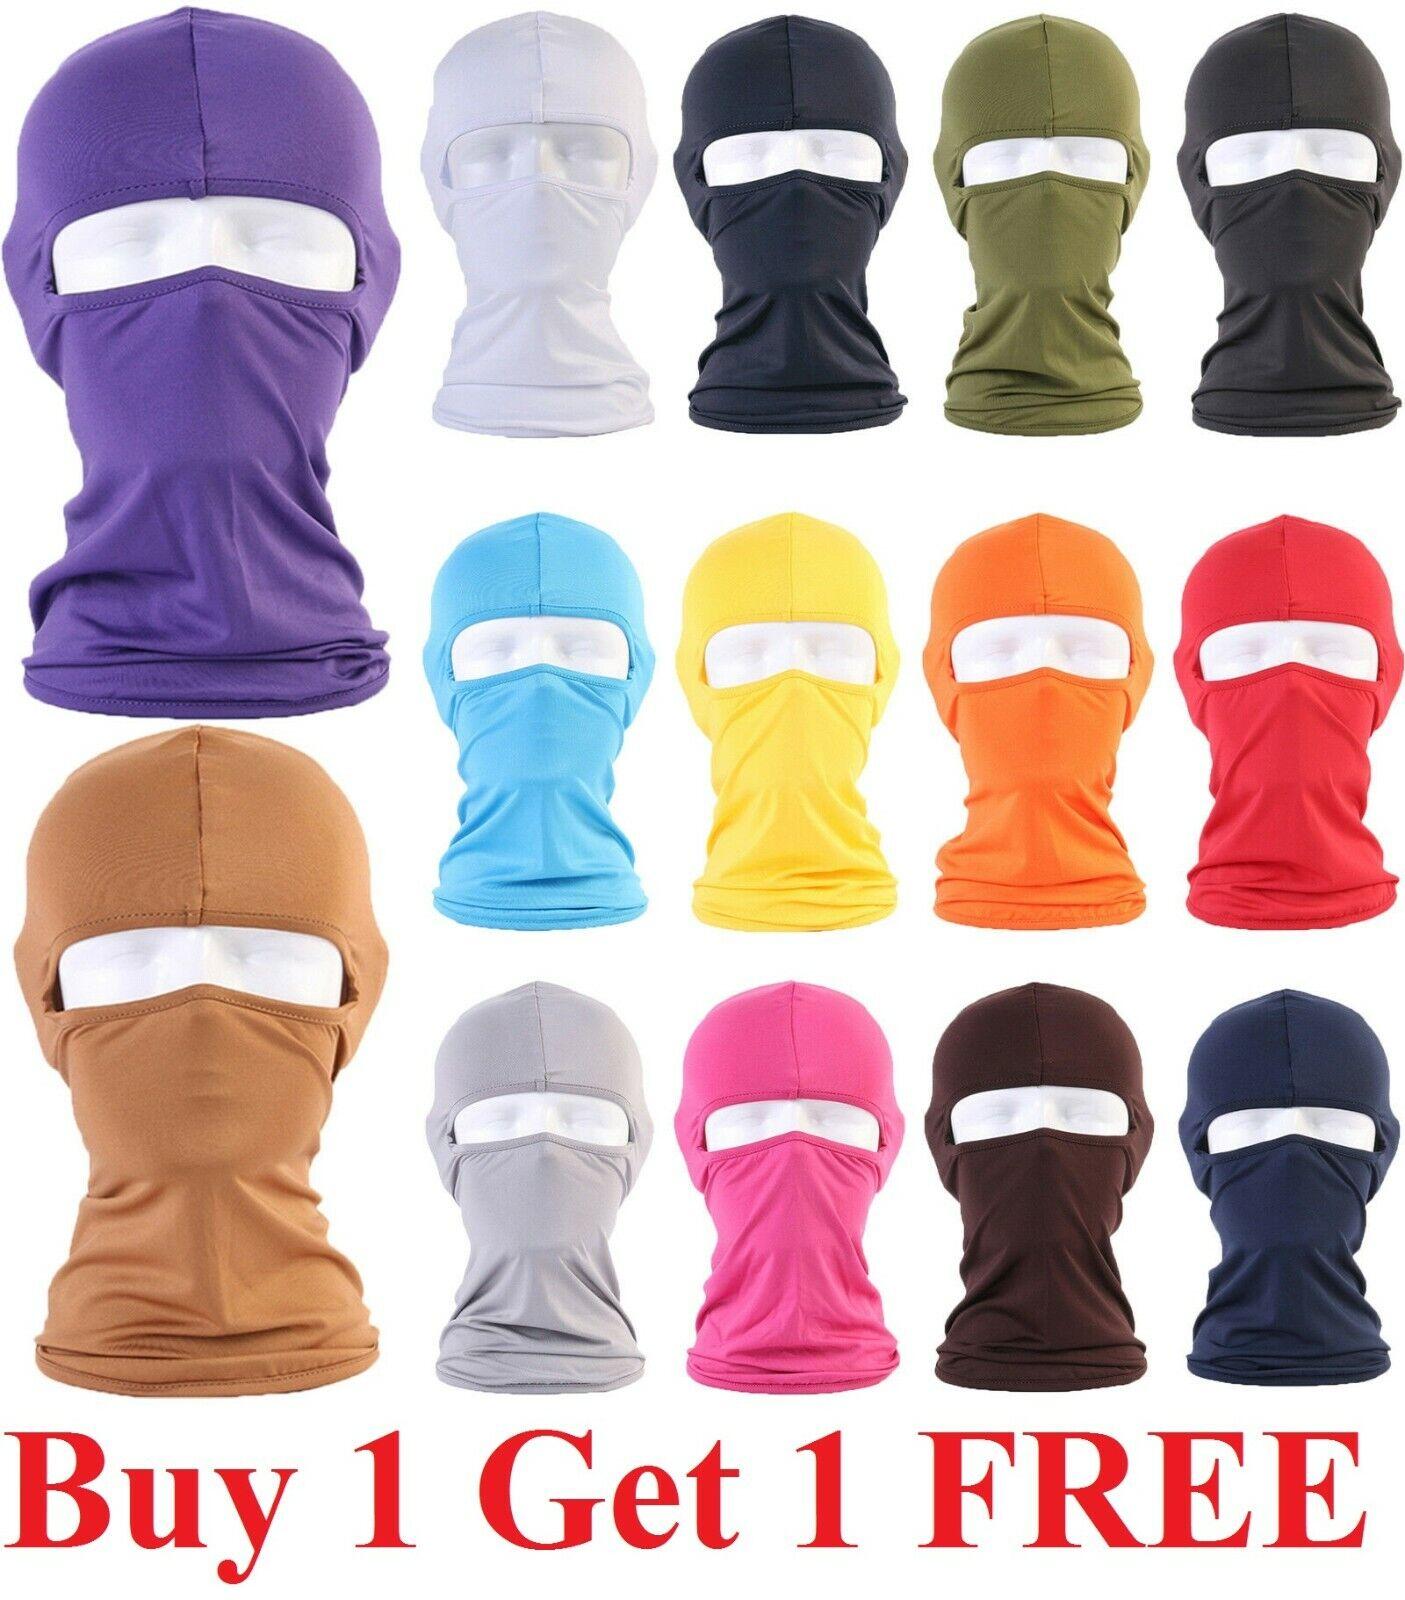 Face Mask Sun Shield Neck Gaiter Bike Balaclava Neckerchief Bandana Headband Clothing, Shoes & Accessories